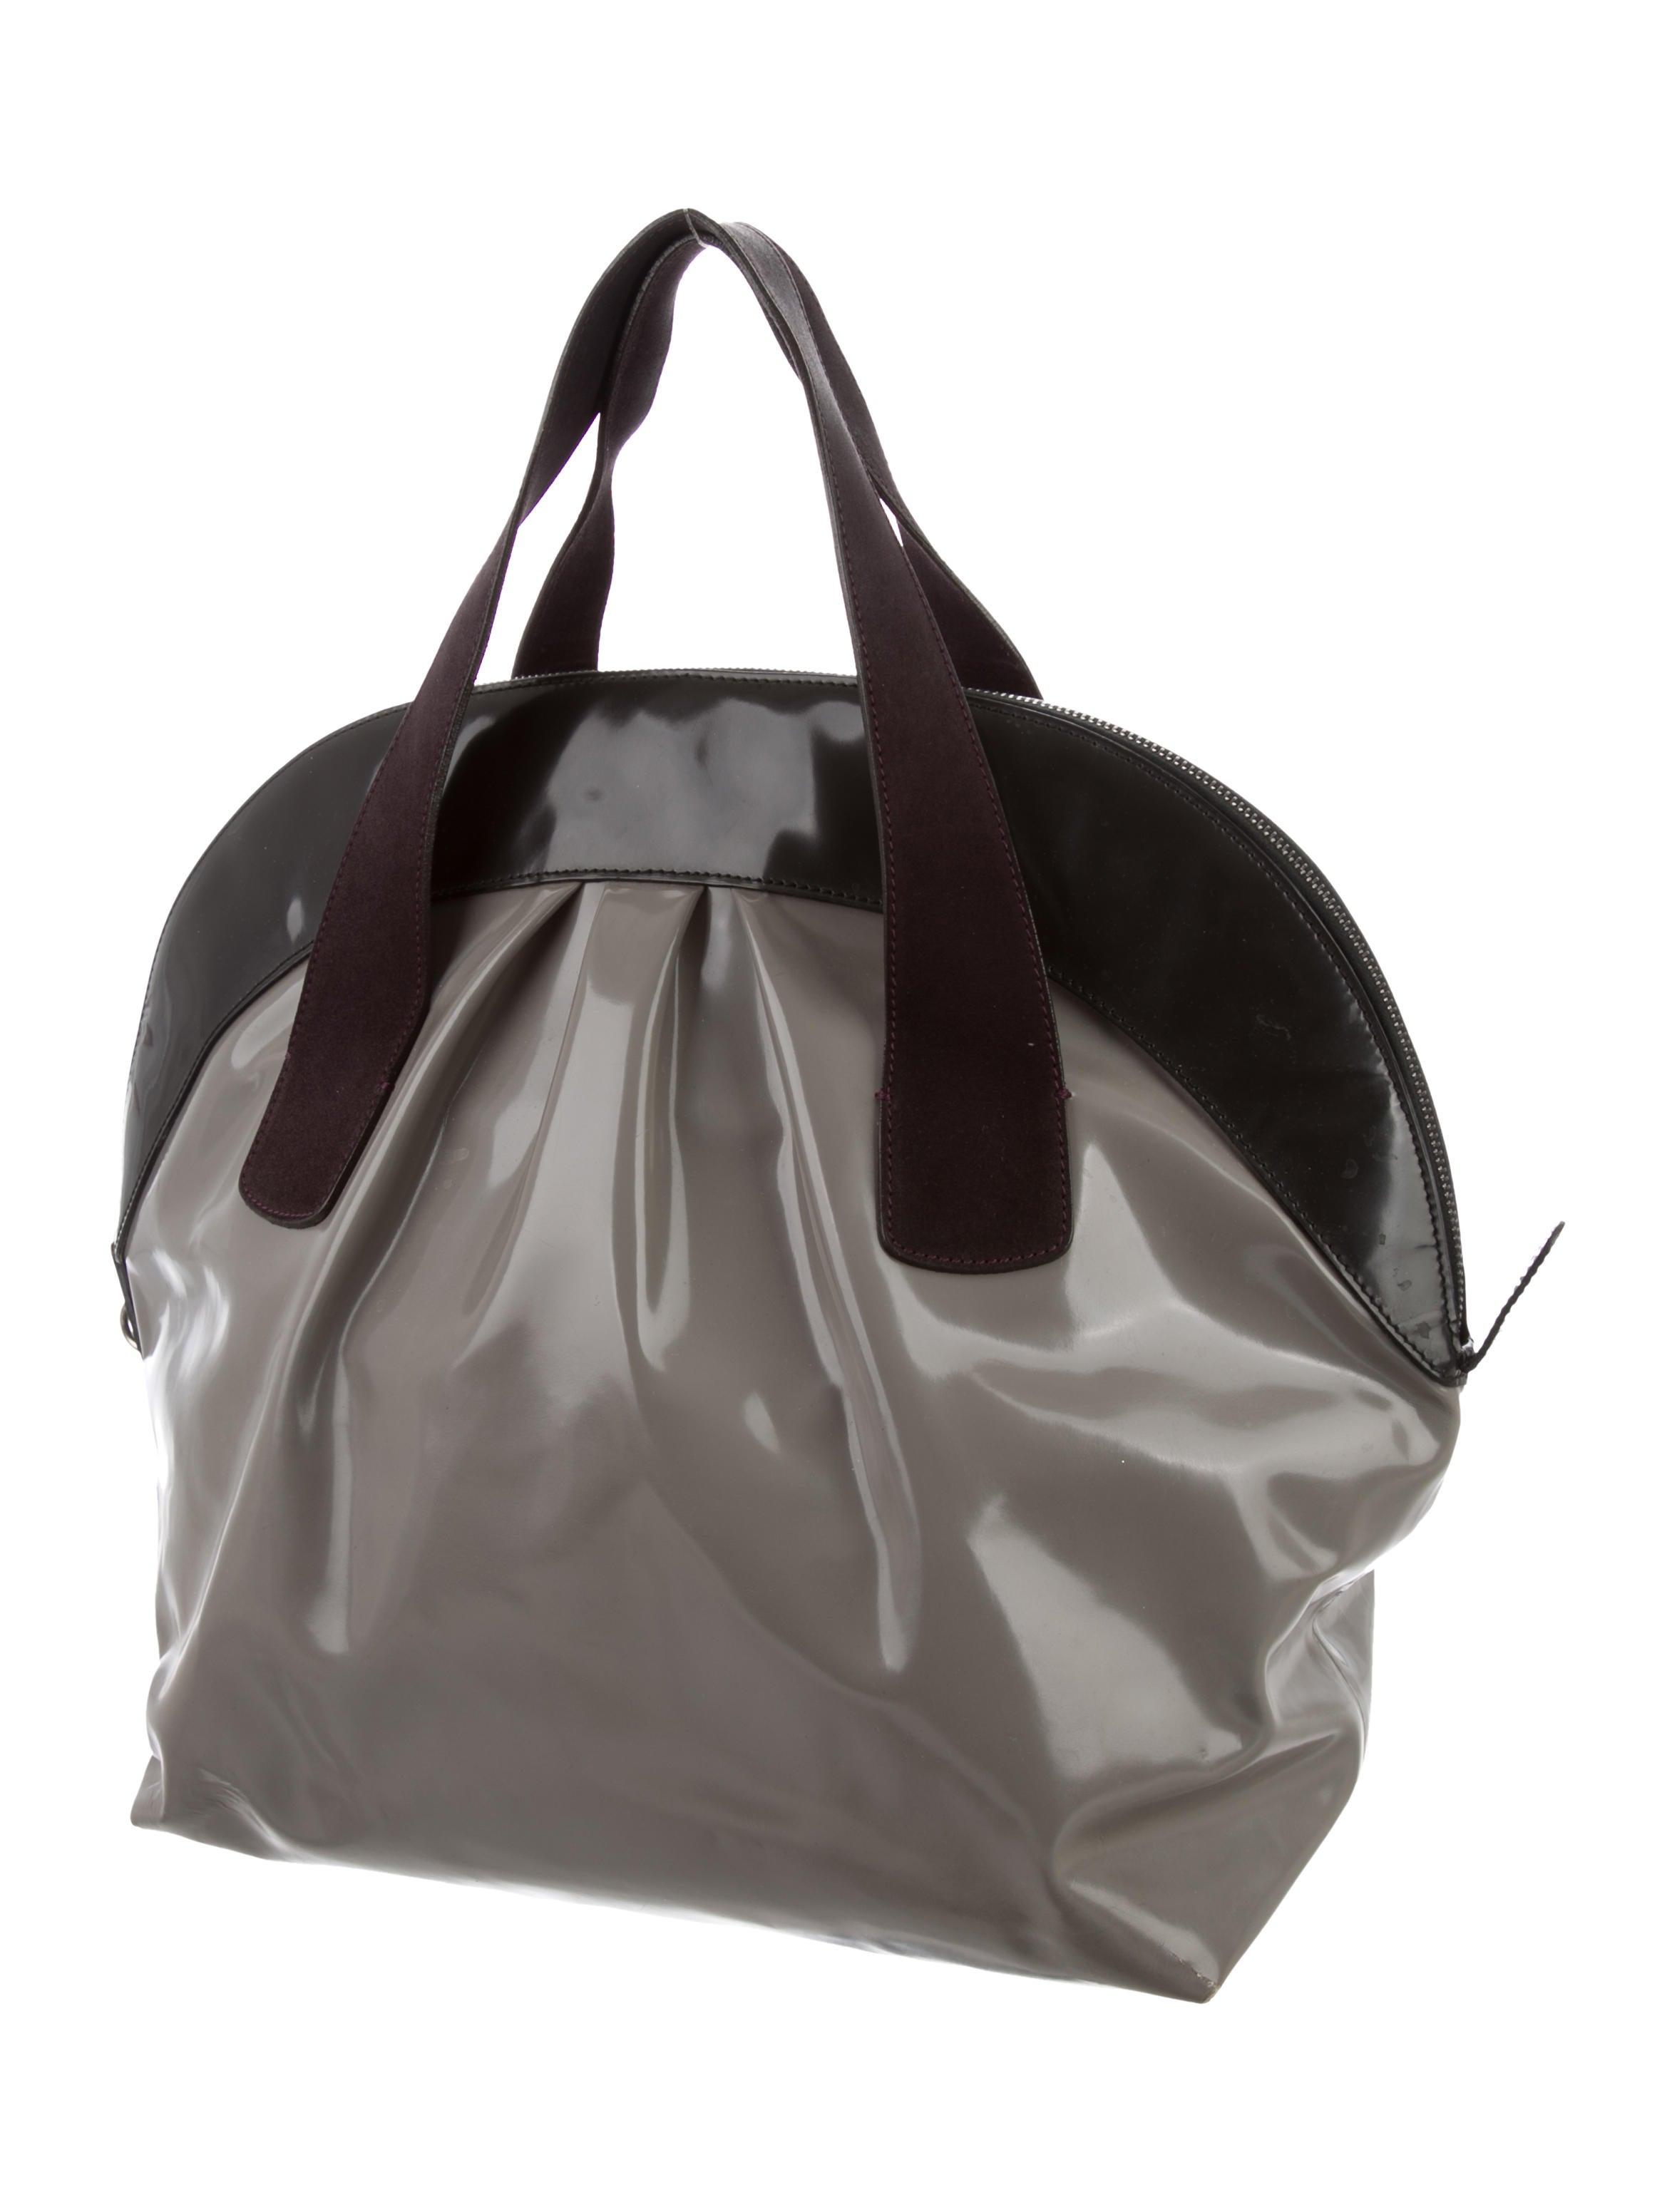 Glazed Leather Bag